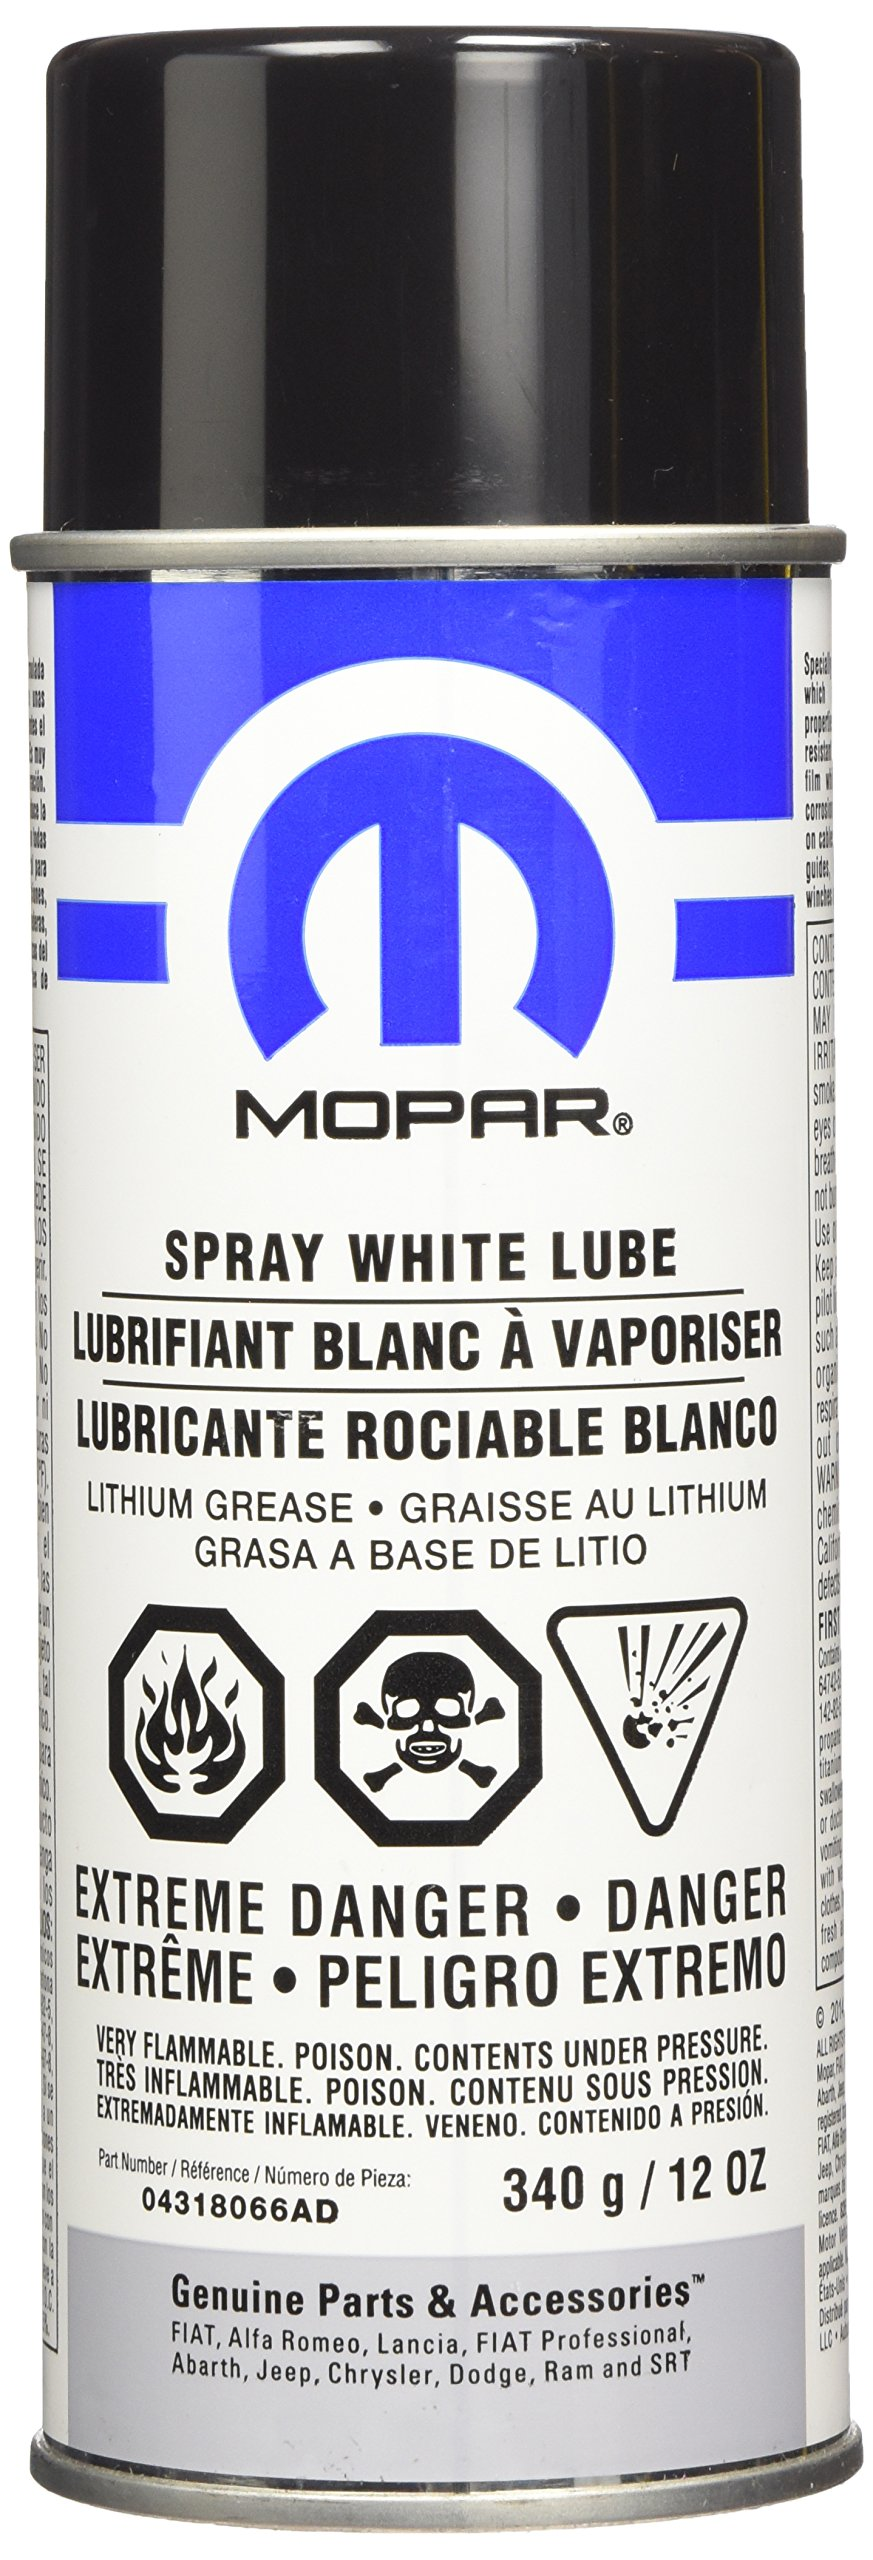 Genuine Chrysler Accessories 4318066AC White Lube Lithium Grease Spray - 12 oz. Aerosol Can